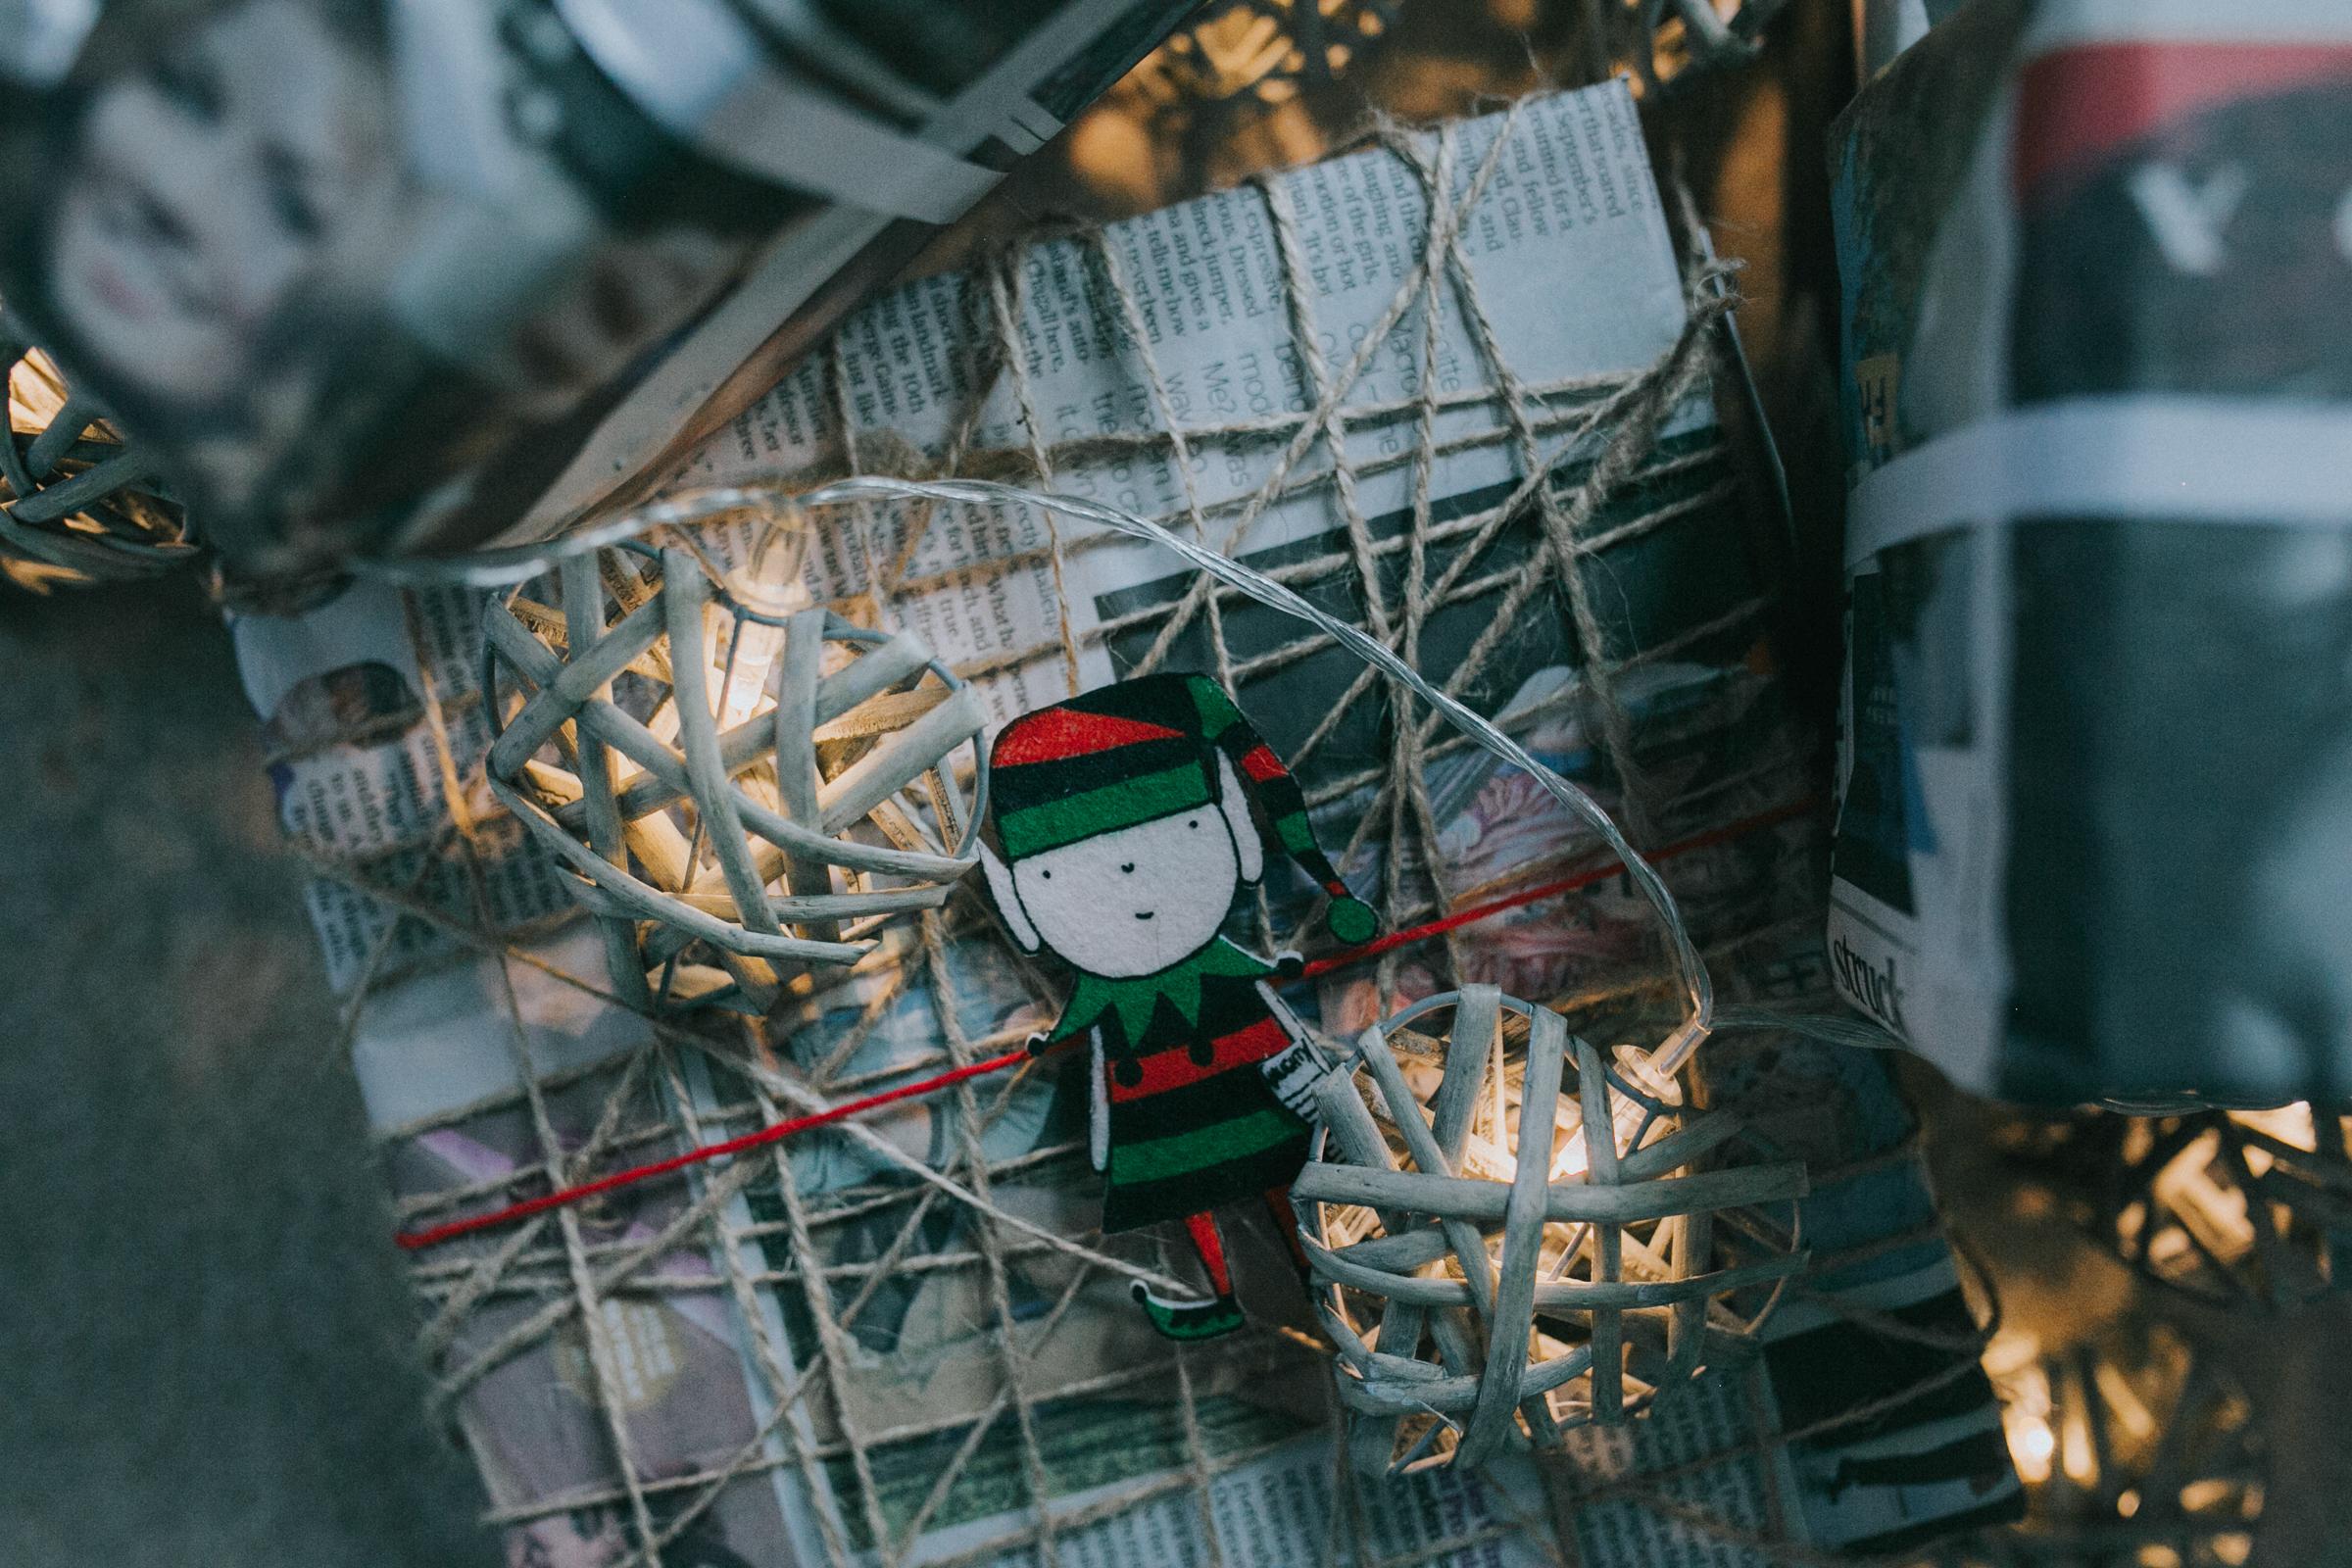 Christmas-gift-wrapping-ideas-minas-planet-minasplanet-how-to-wrap-christmas-presents-diy1.jpg